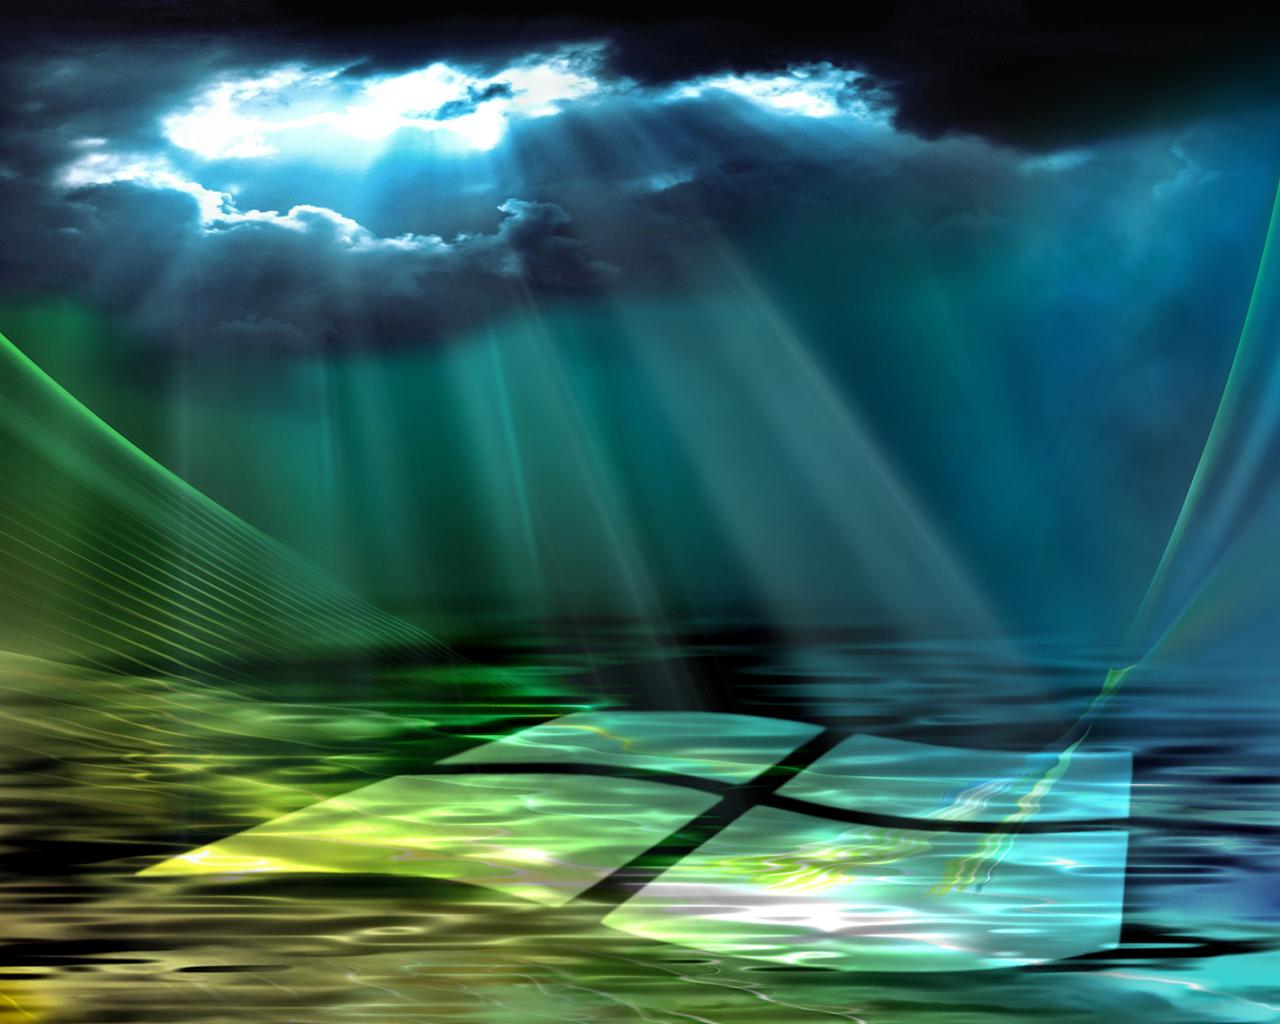 http://1.bp.blogspot.com/_pyt54oa9Ahk/TU7O0IM20qI/AAAAAAAAAAU/v21P6PFPgYs/s1600/windows-vista-aurora-dream-wallpaper-446971.jpg